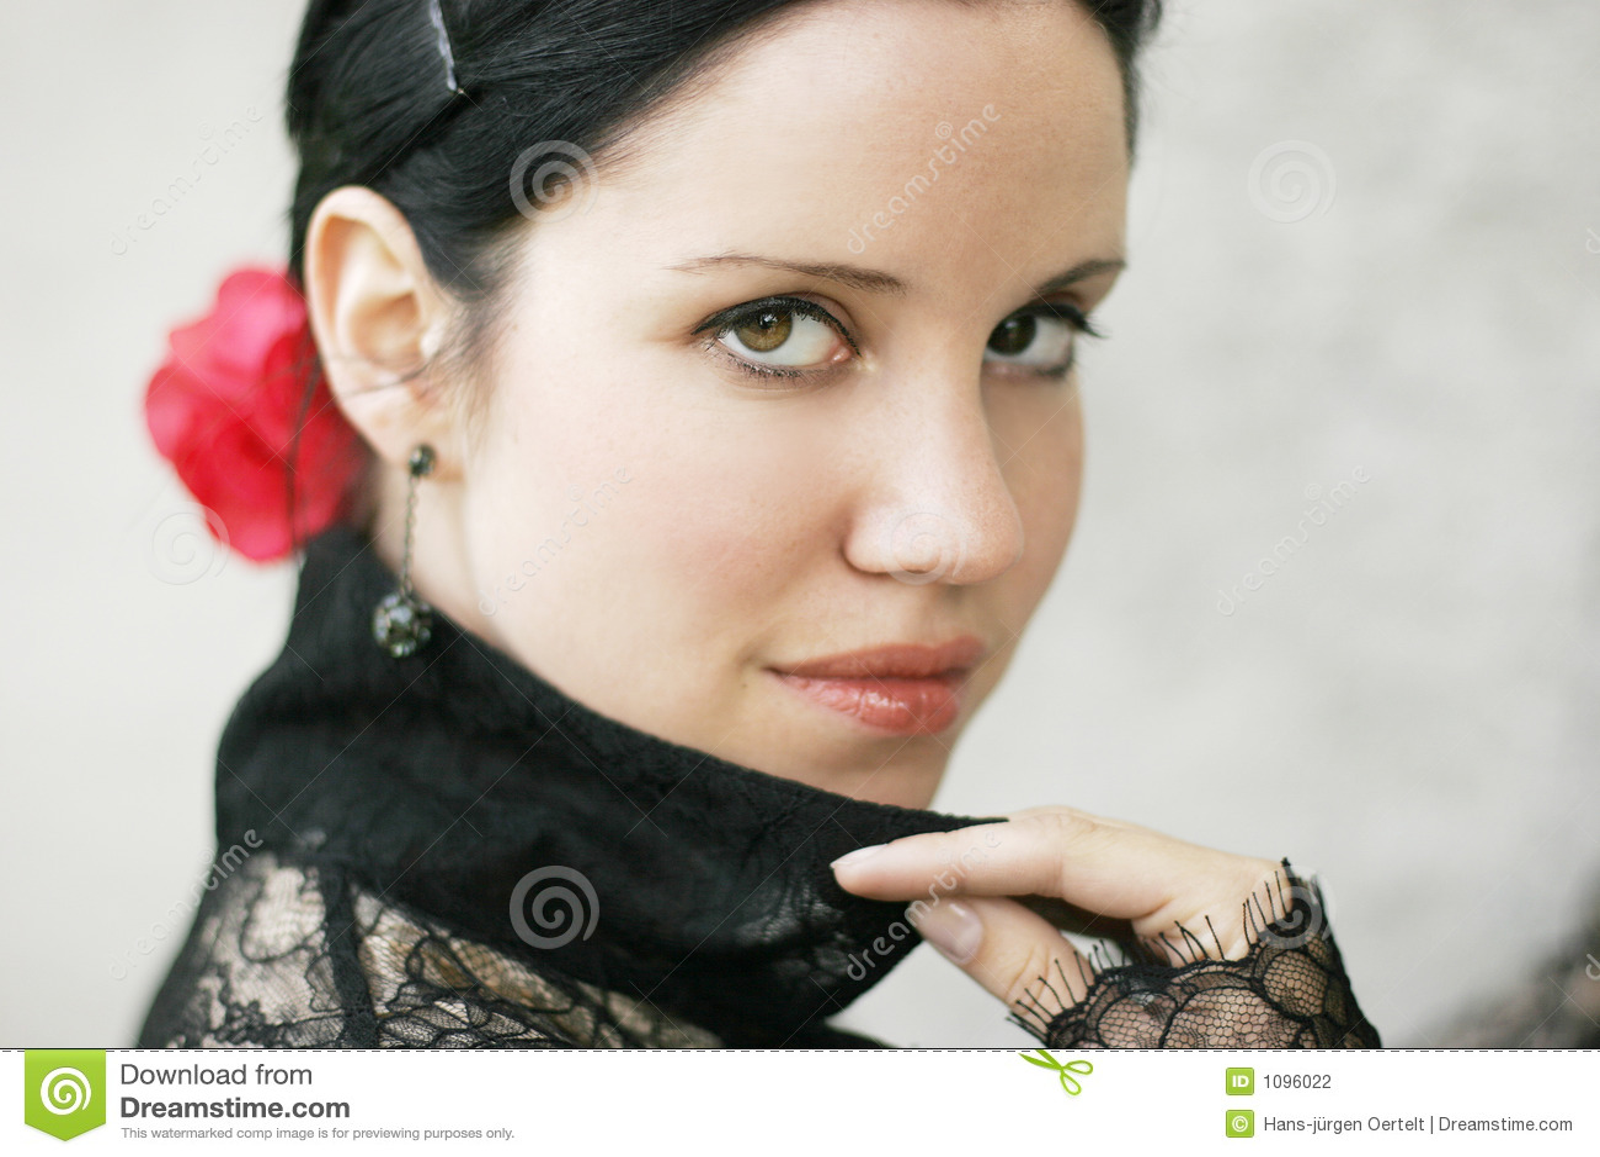 Arunsawat Free Lady Spanish